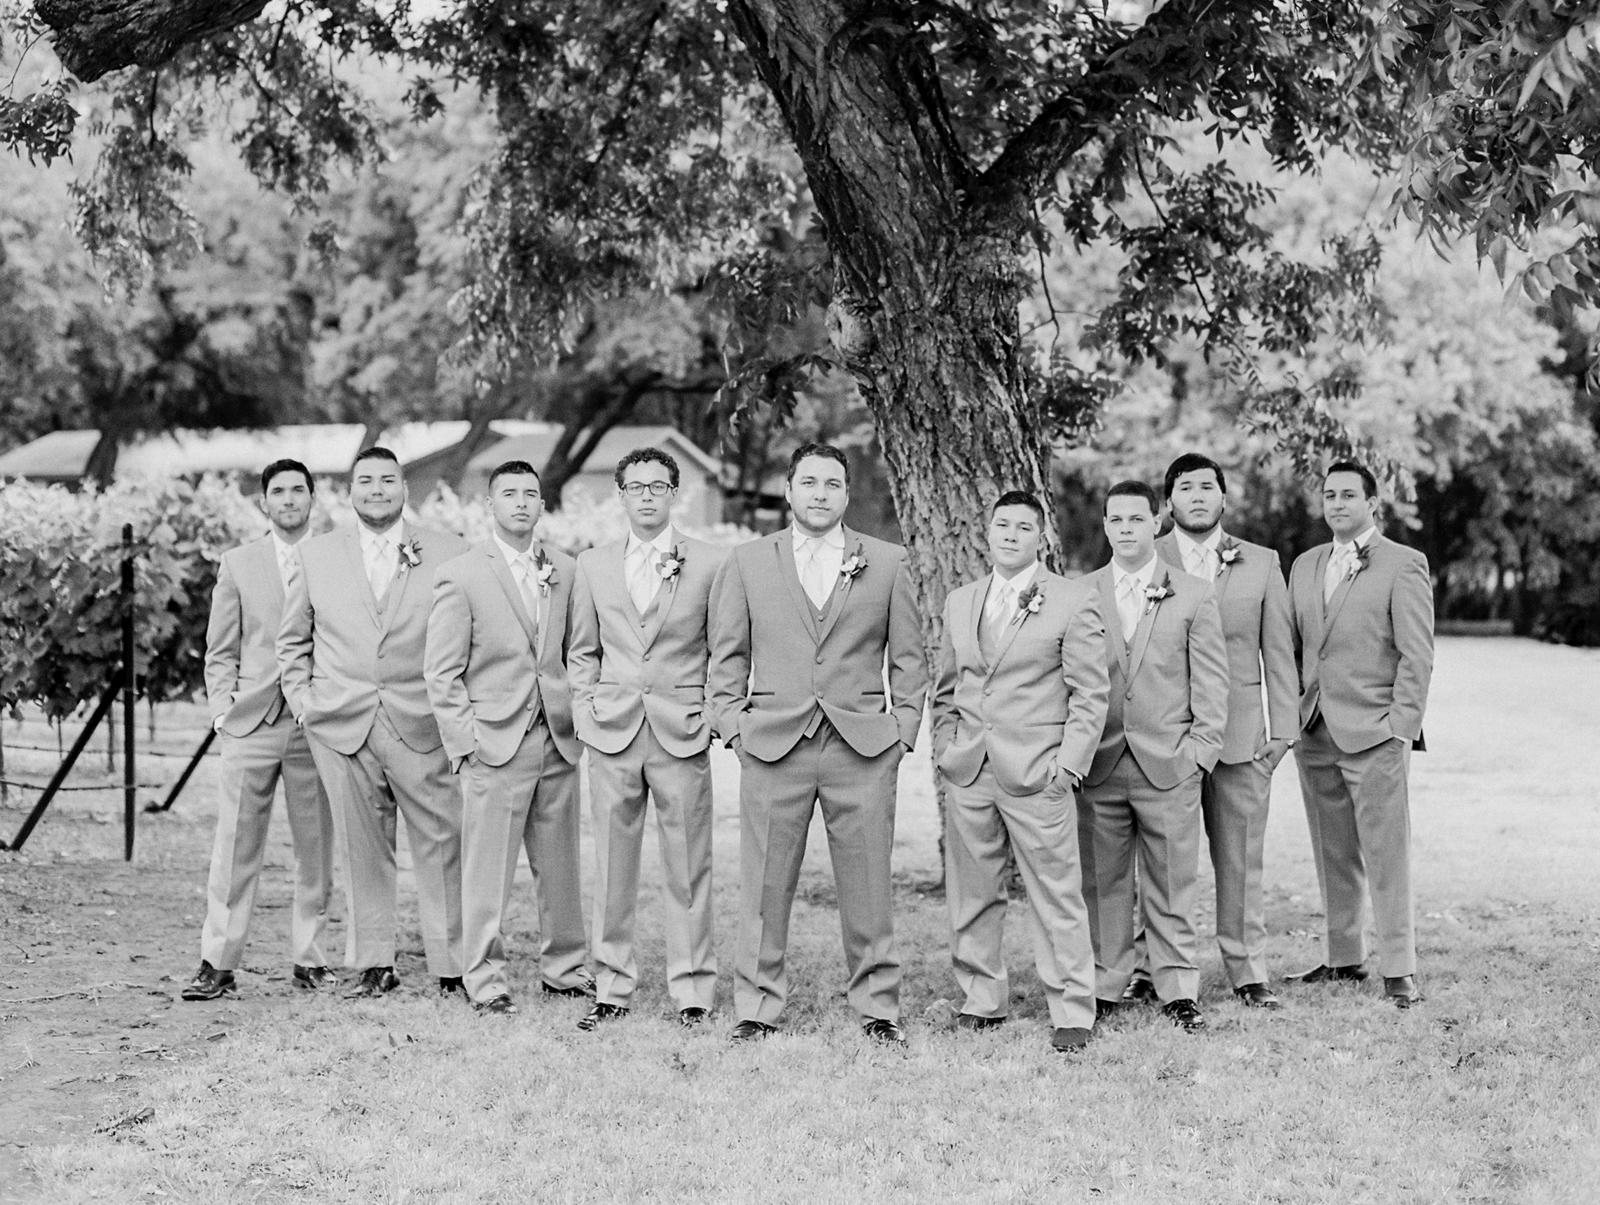 Elegant Spring Vineyard Wedding | Film Wedding Photographer | Austin Wedding Photographer | Groomsmen Photos | Britni Dean Photography // britnidean.com